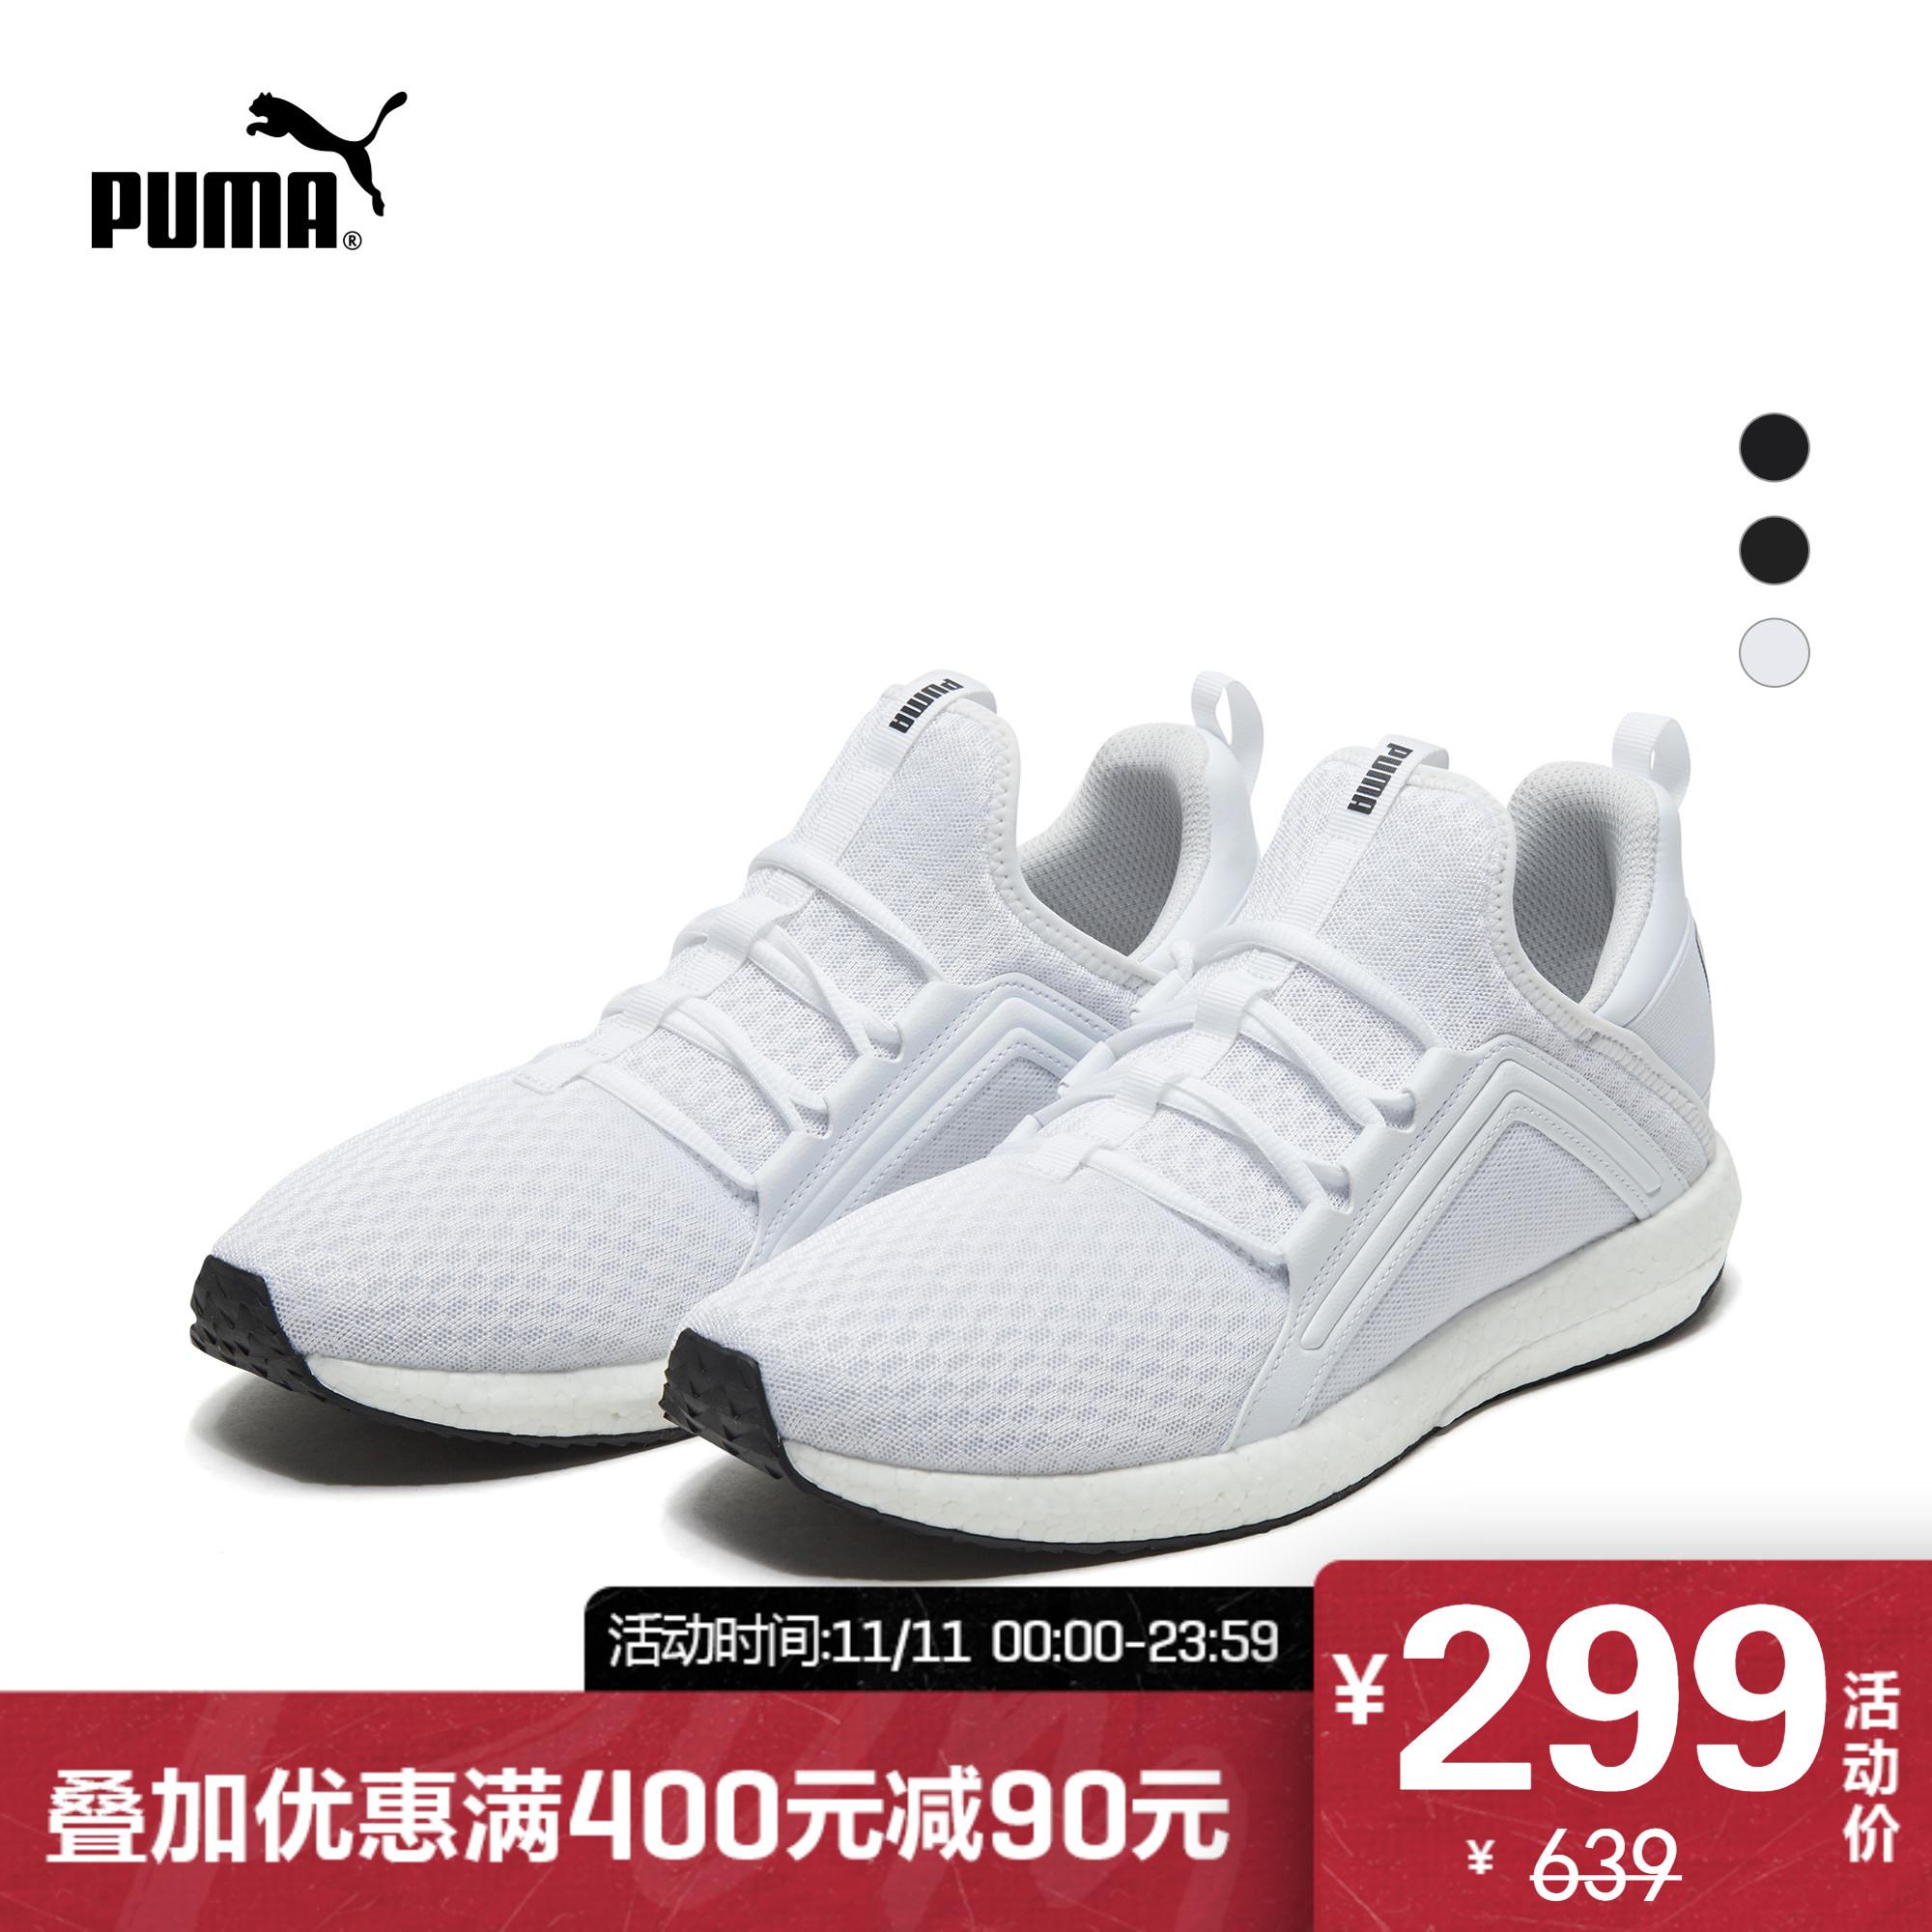 PUMA彪马官方正品  男子缓震跑步鞋 MEGA NRGY 190368